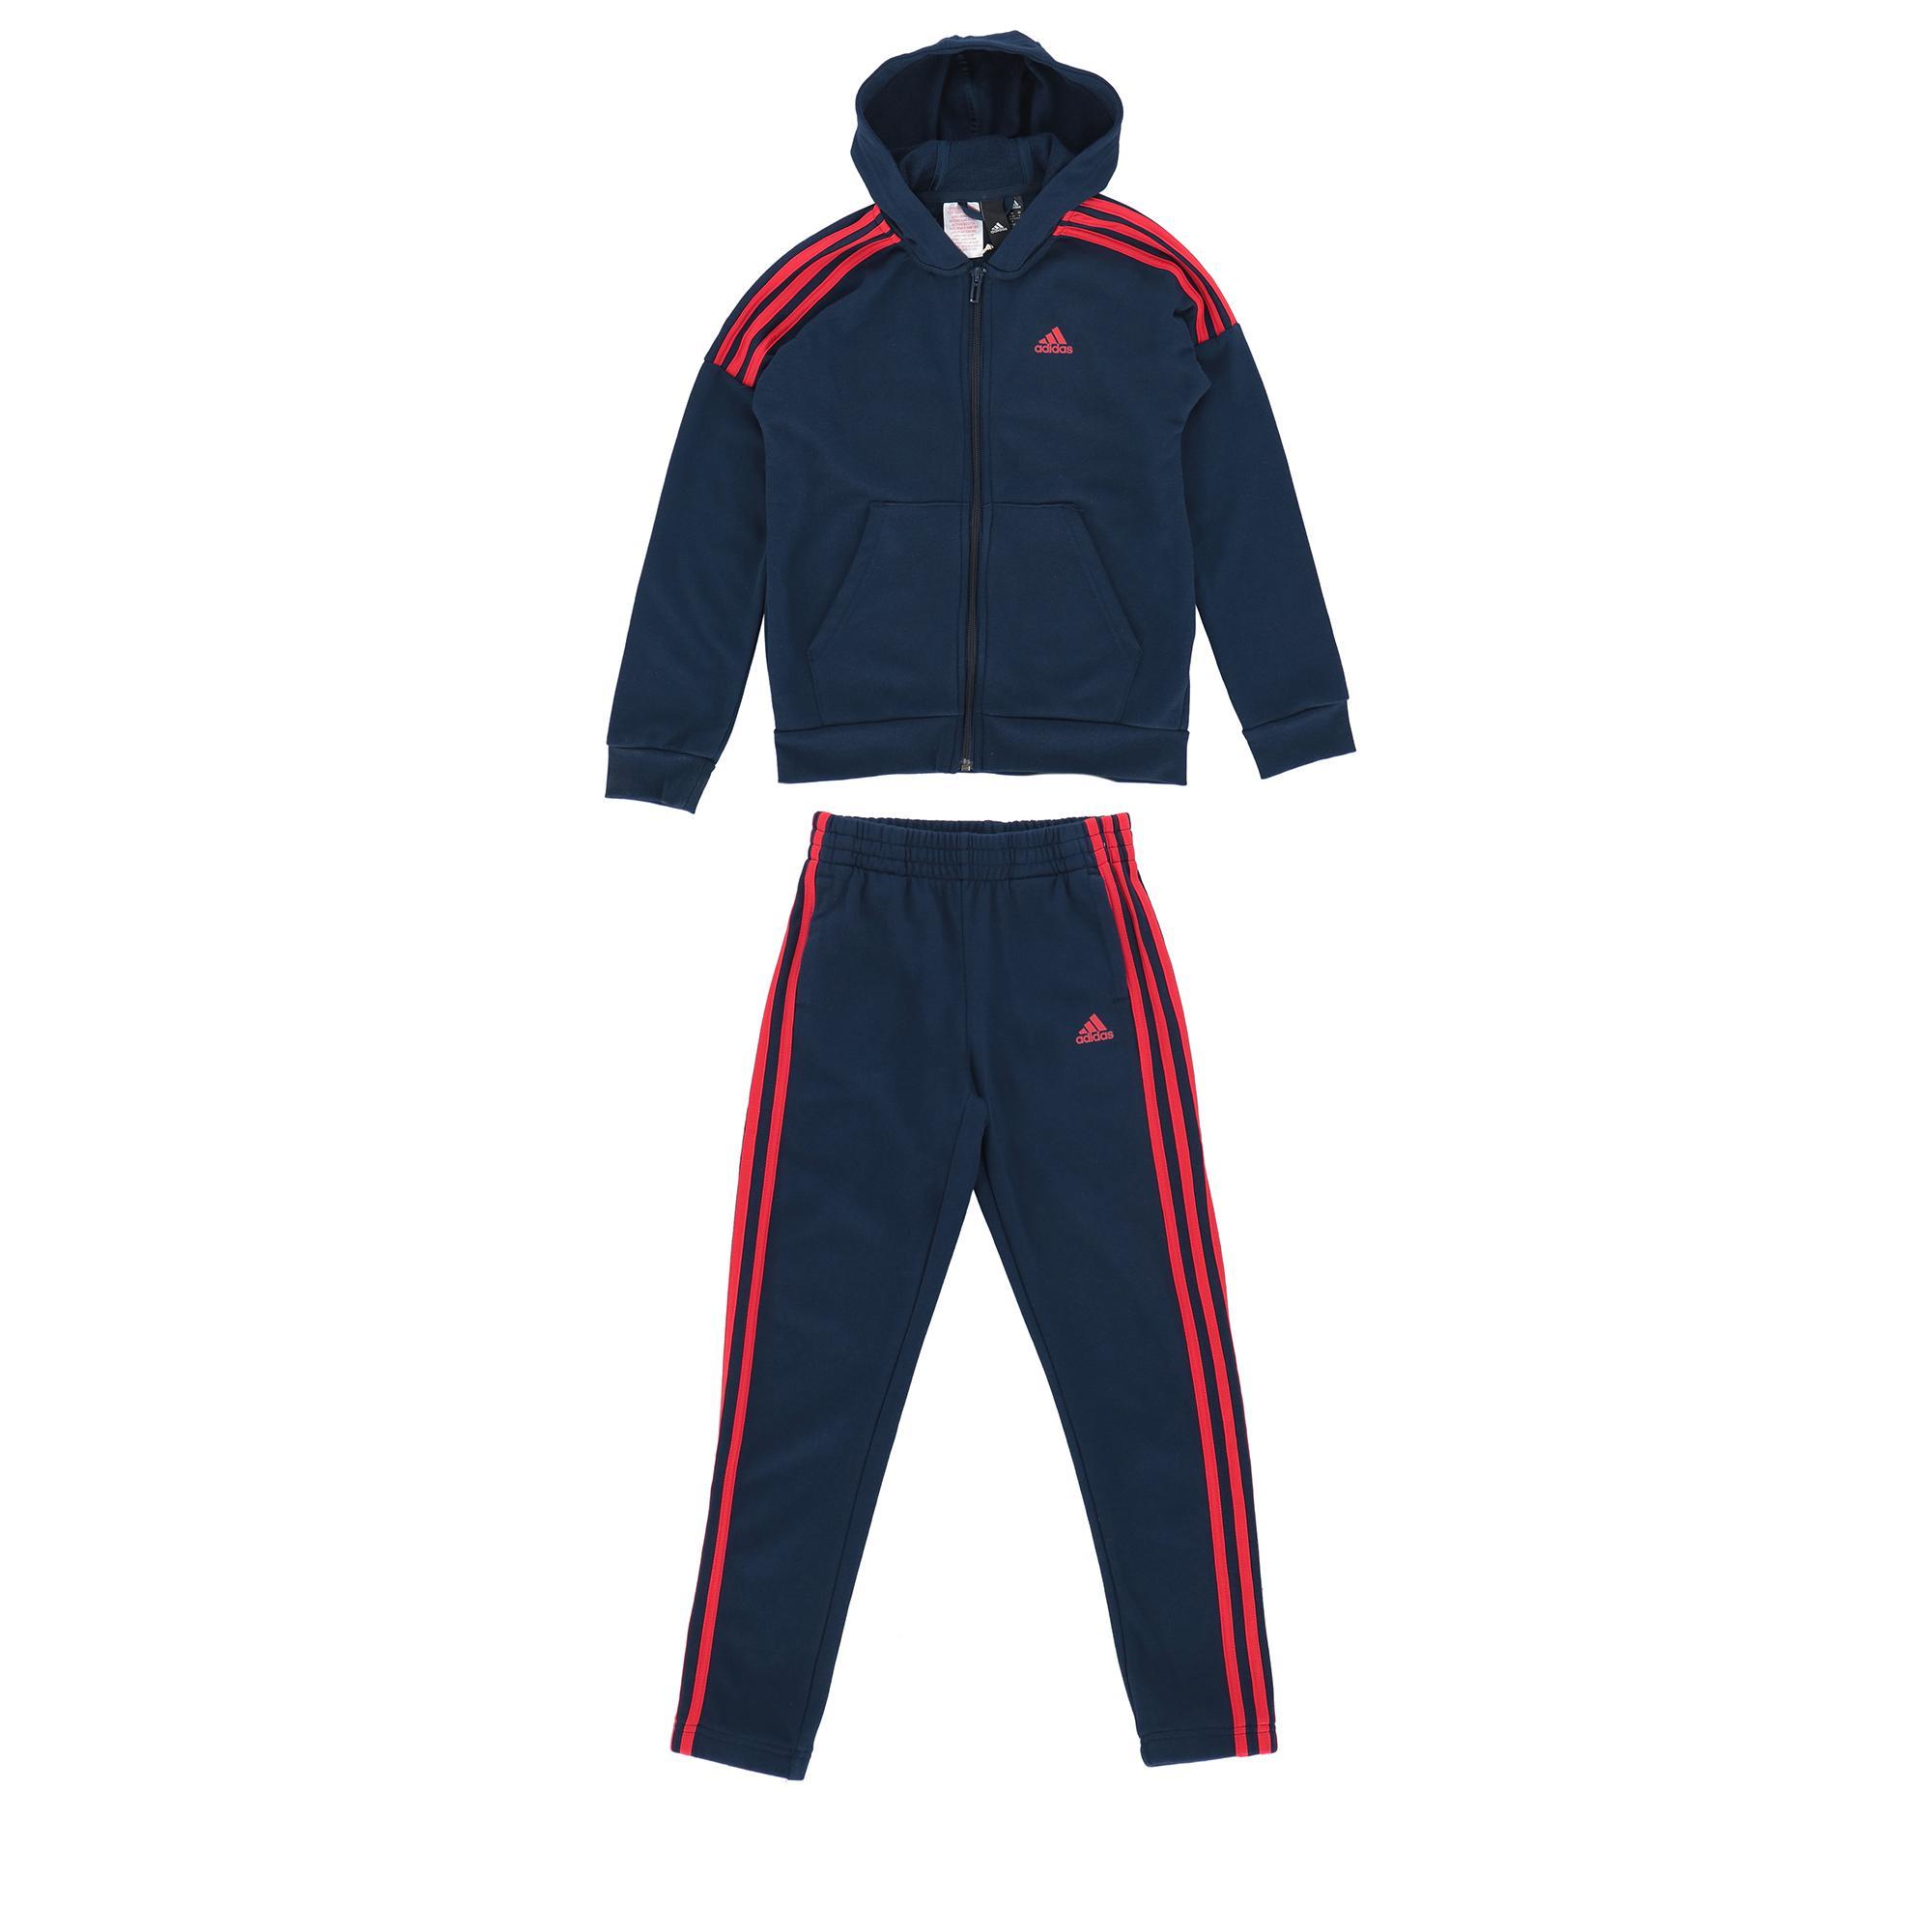 Adidas Jb Cotton Ts Collegiate navy red